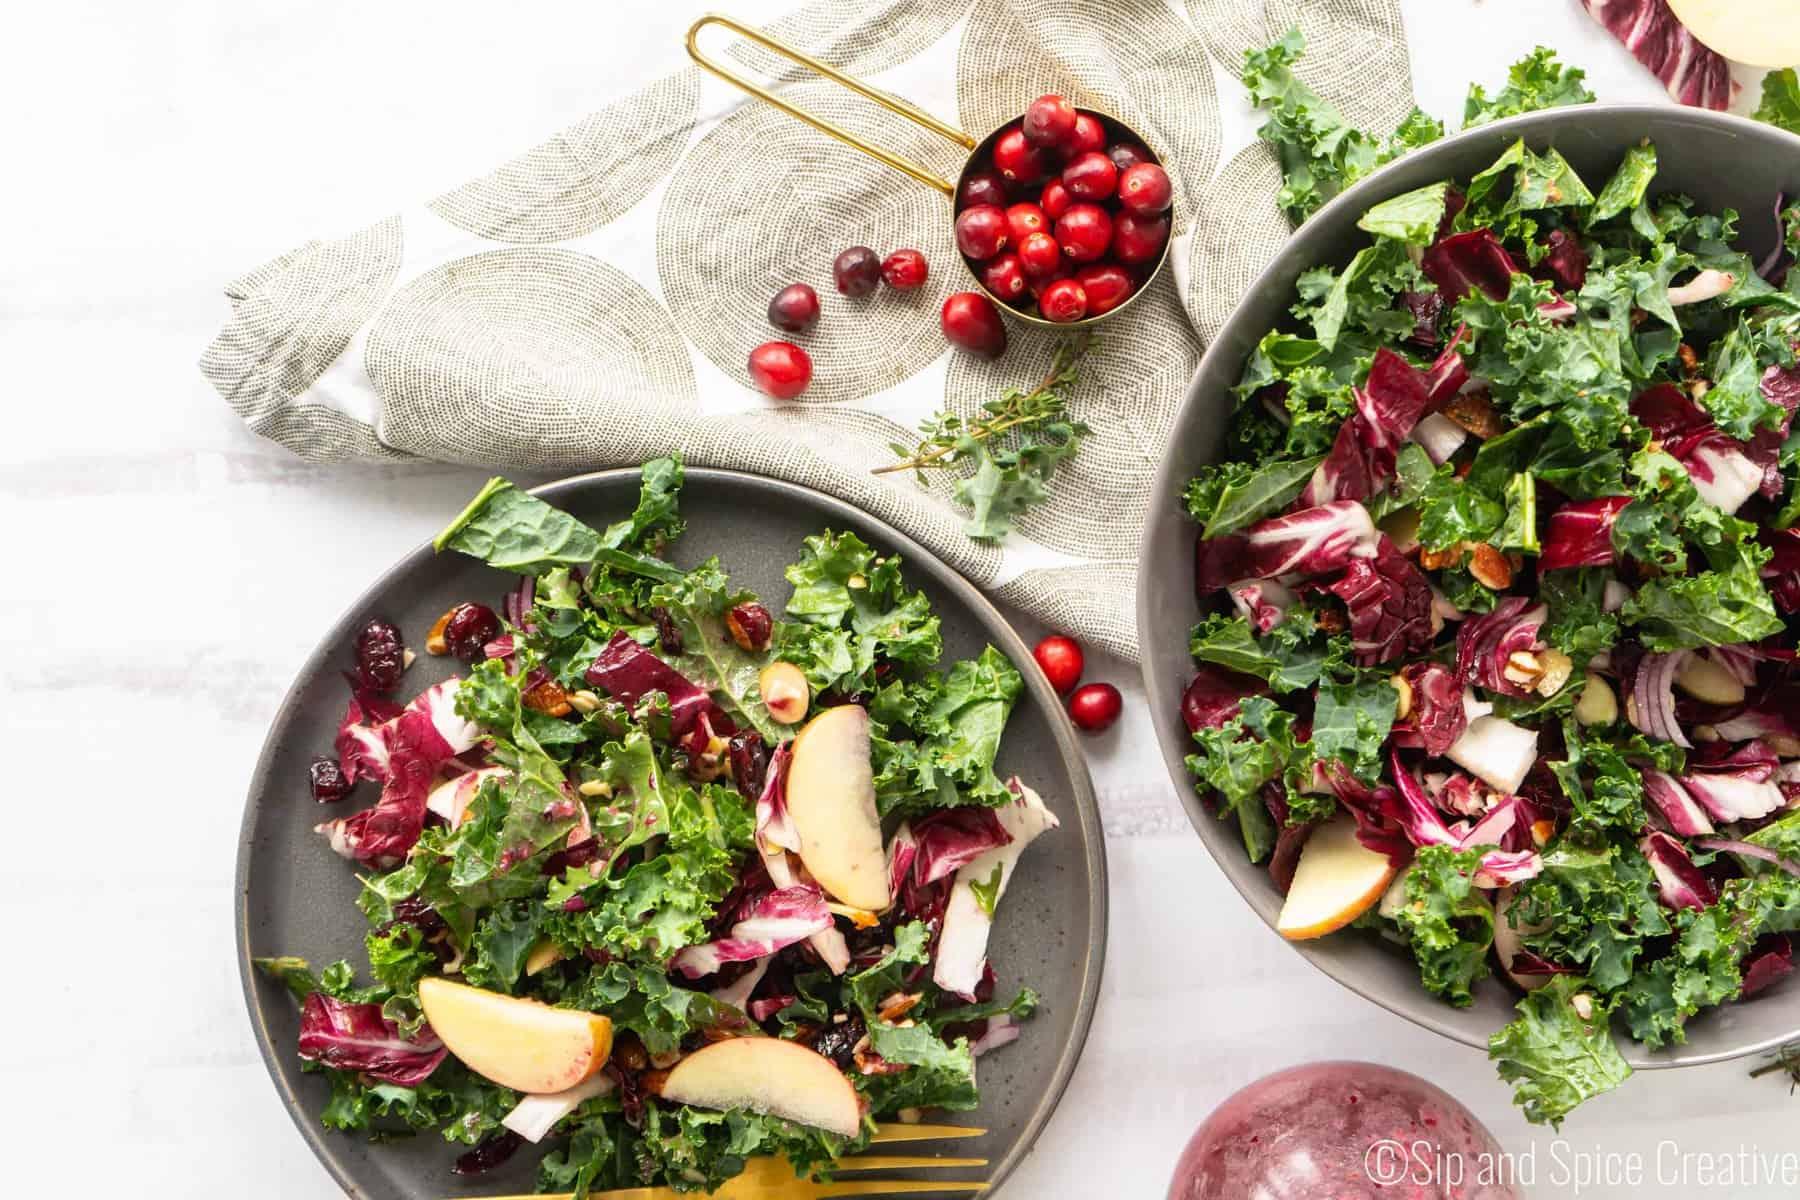 Kale and Radicchio Salad with Fresh Cranberry Vinaigrette